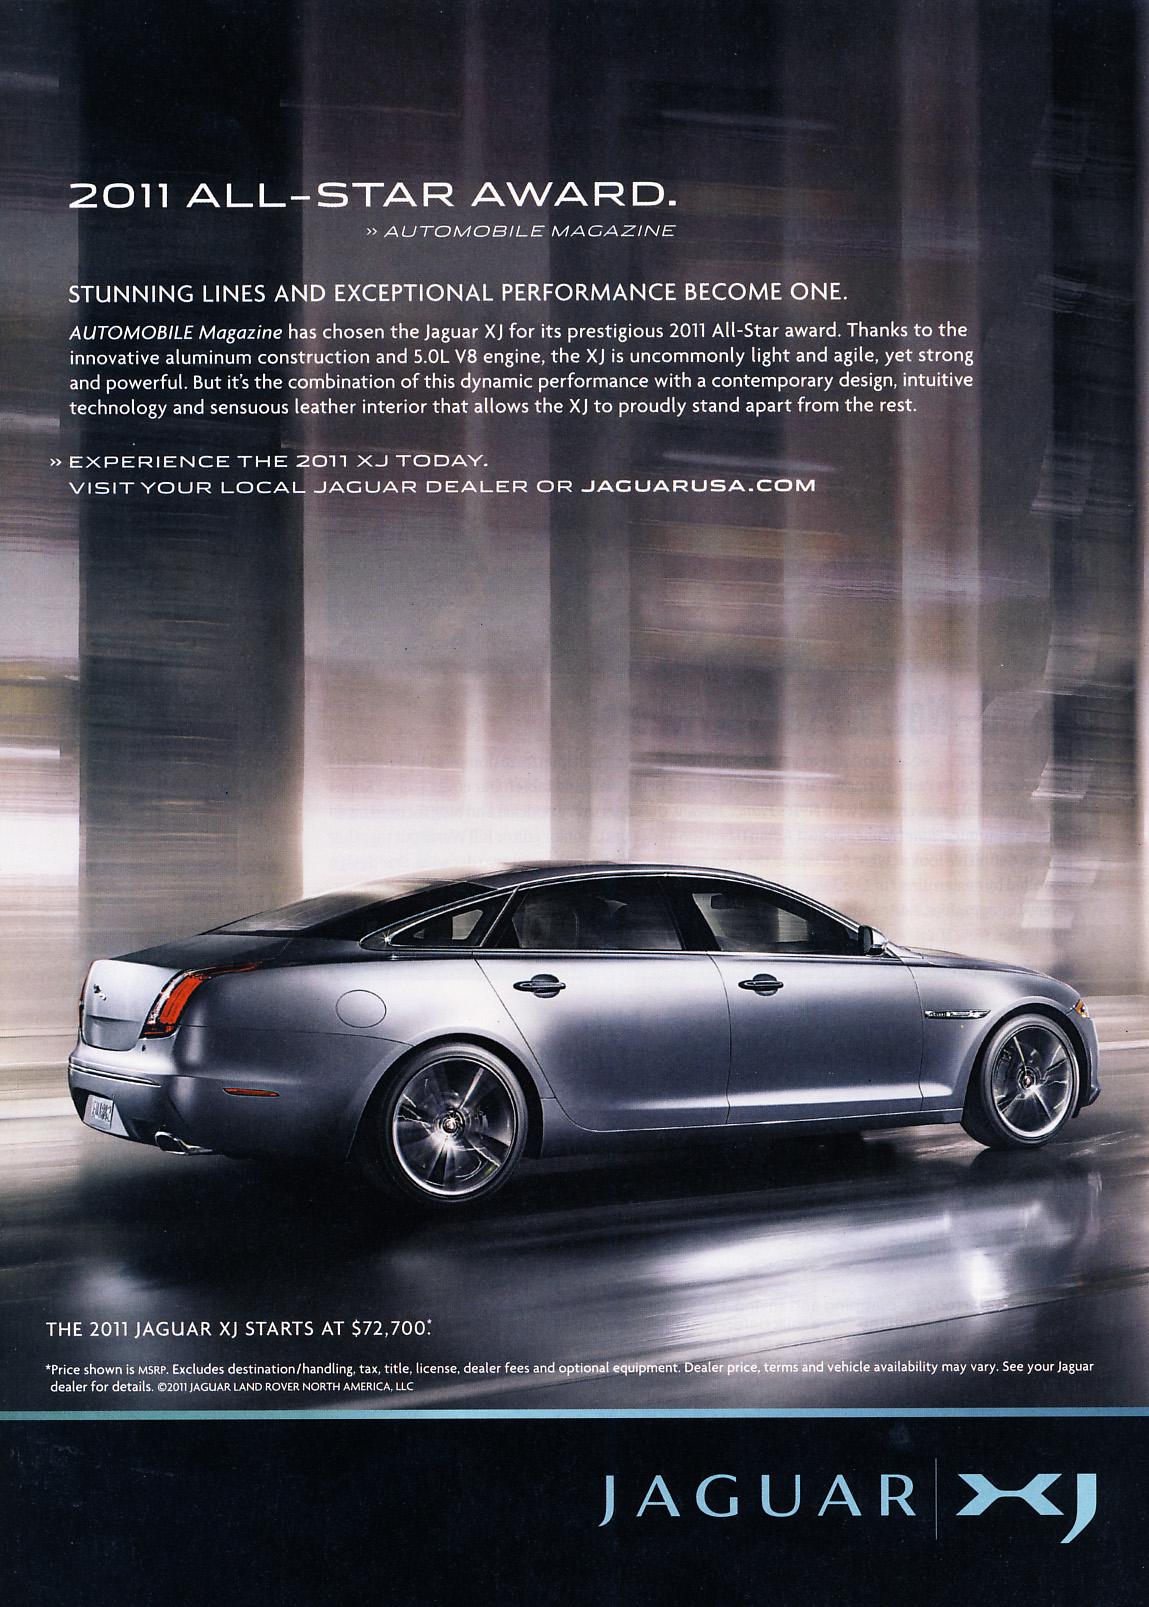 Why Hyundai Is Better Than Porsche Or Jaguar